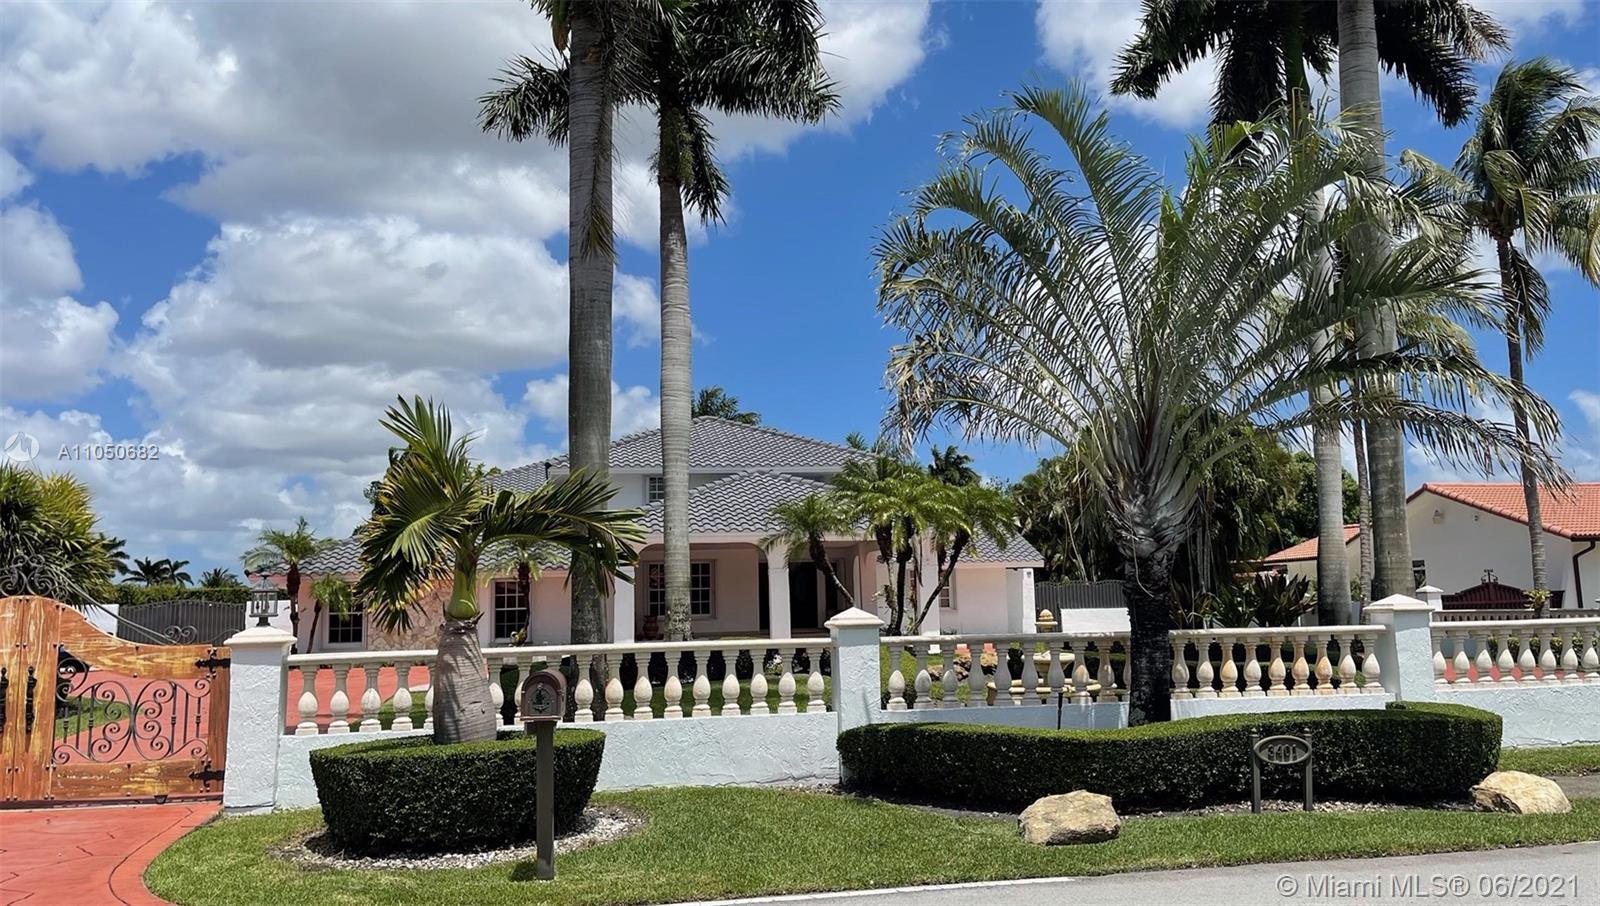 J G Heads Farms - 3401 SW 129th Ave, Miami, FL 33175